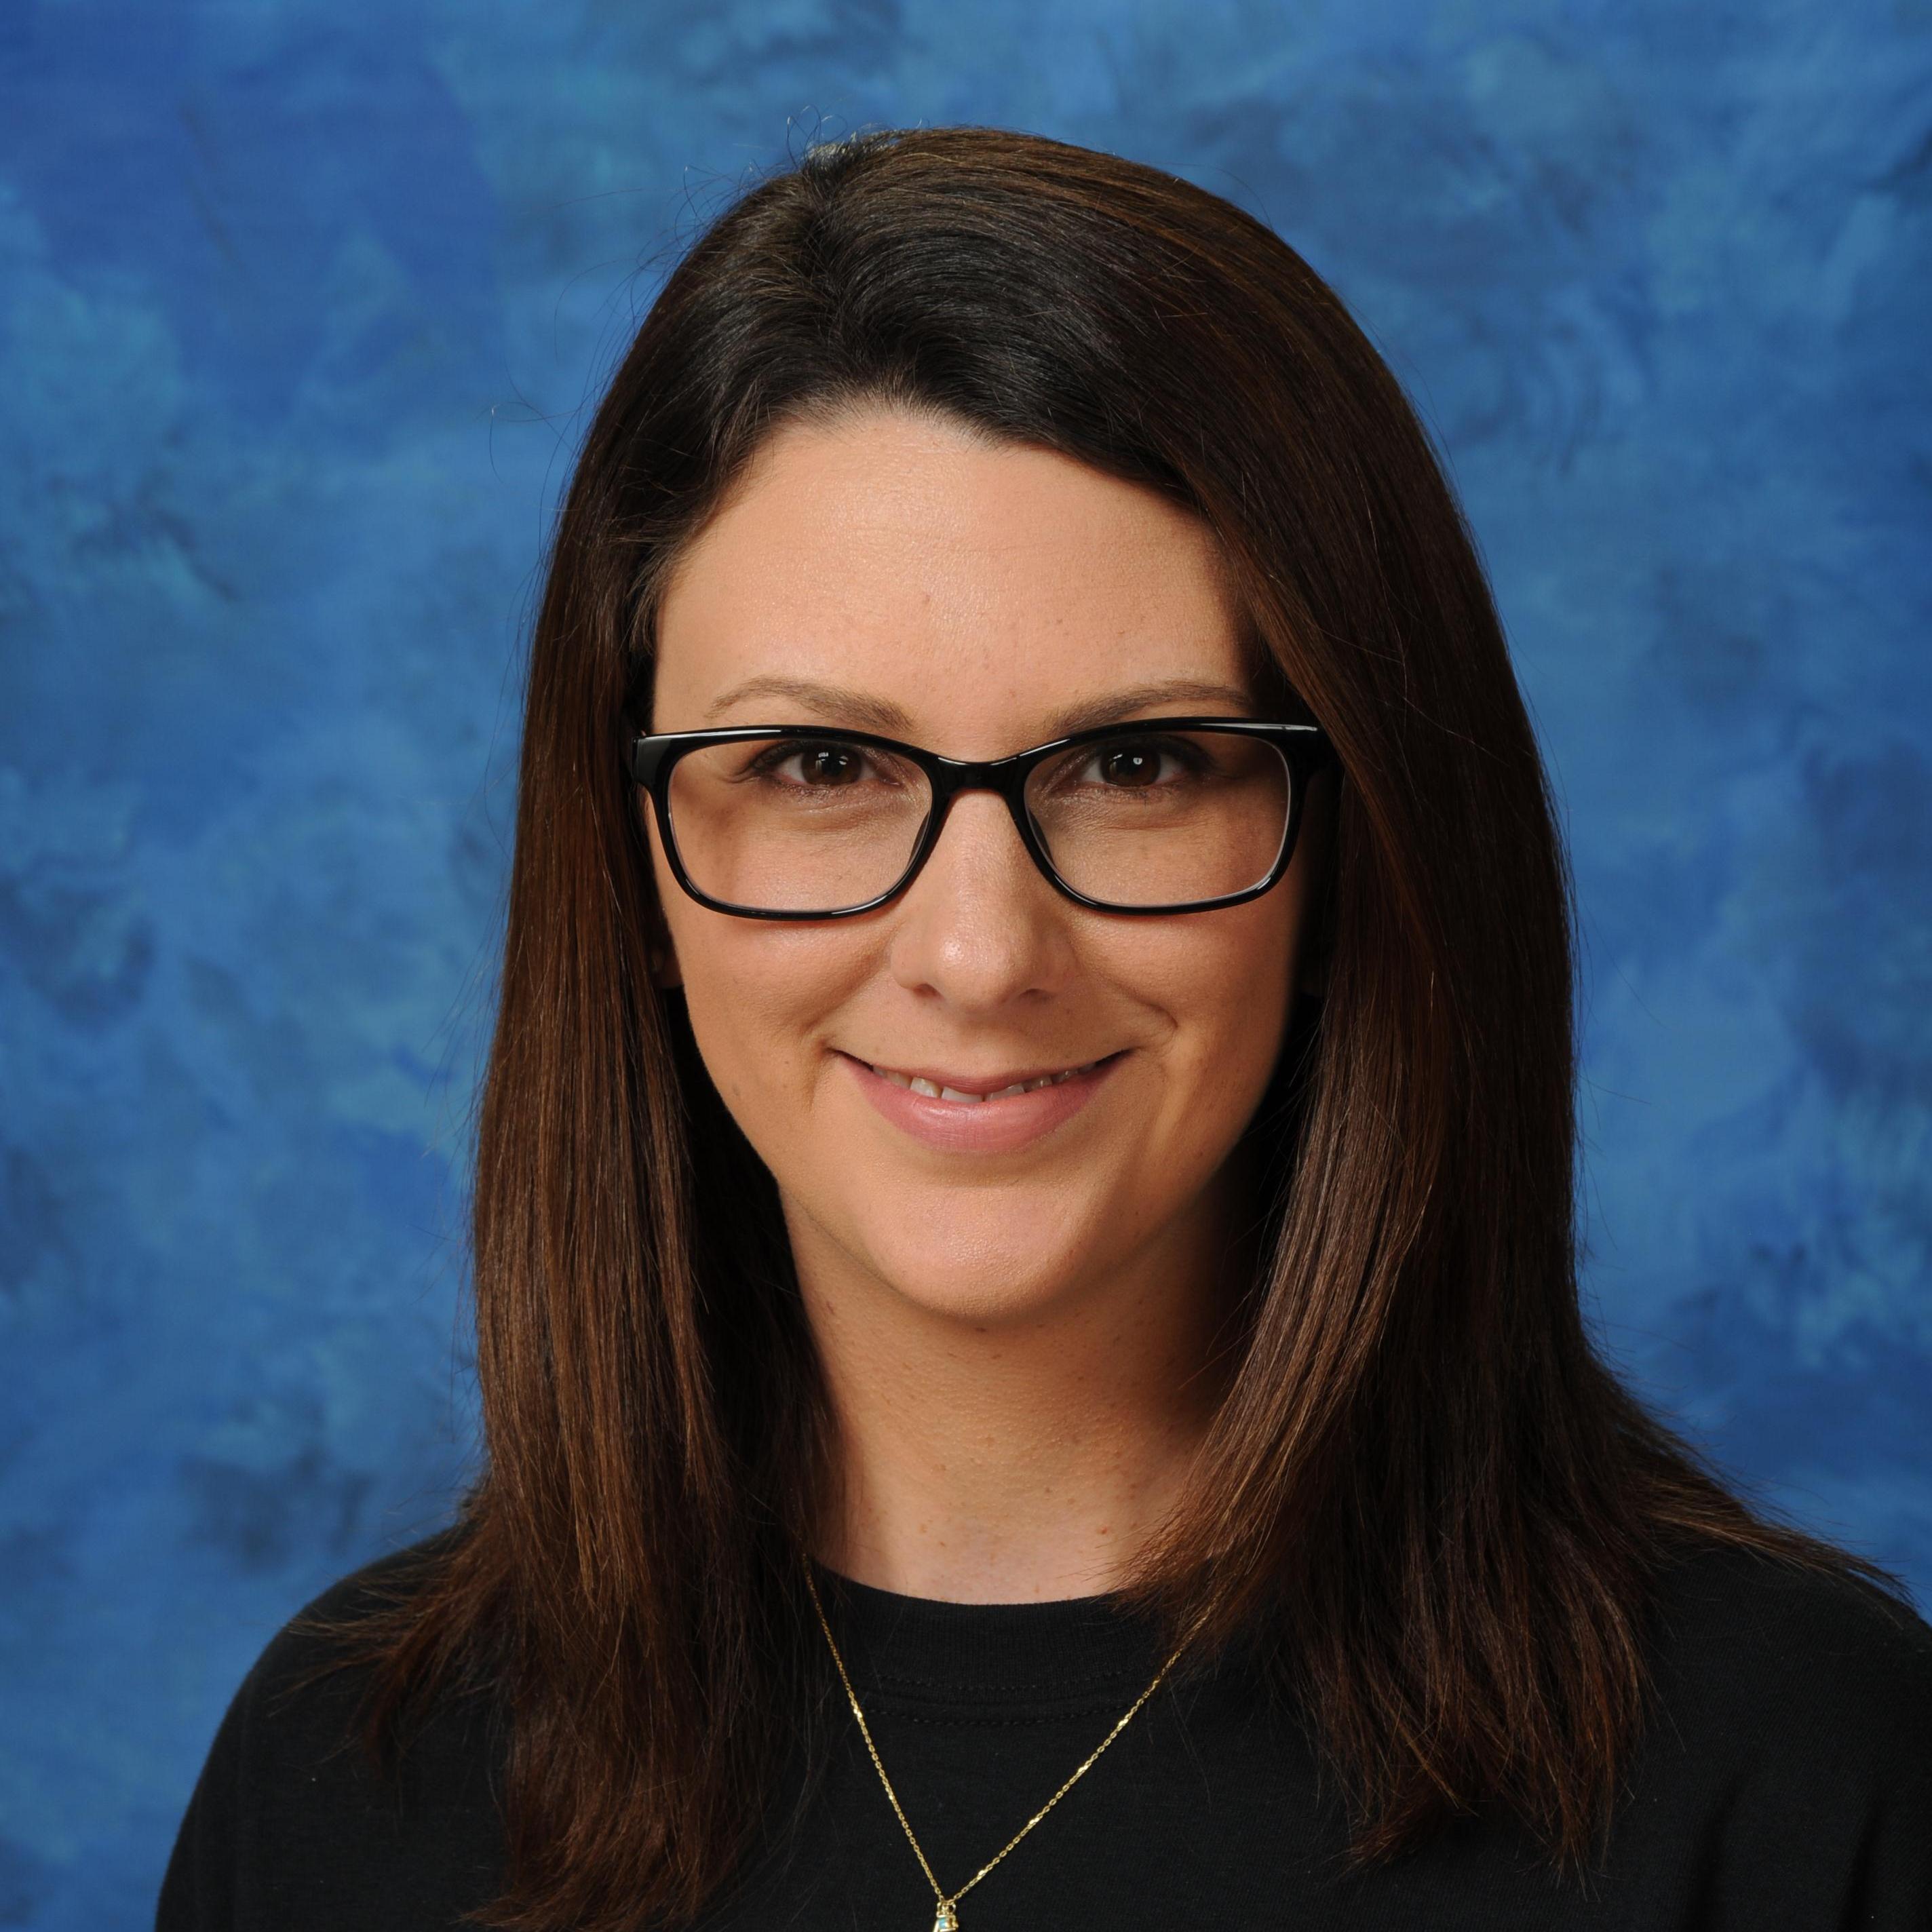 Kelly Schanzer, M.Ed.'s Profile Photo